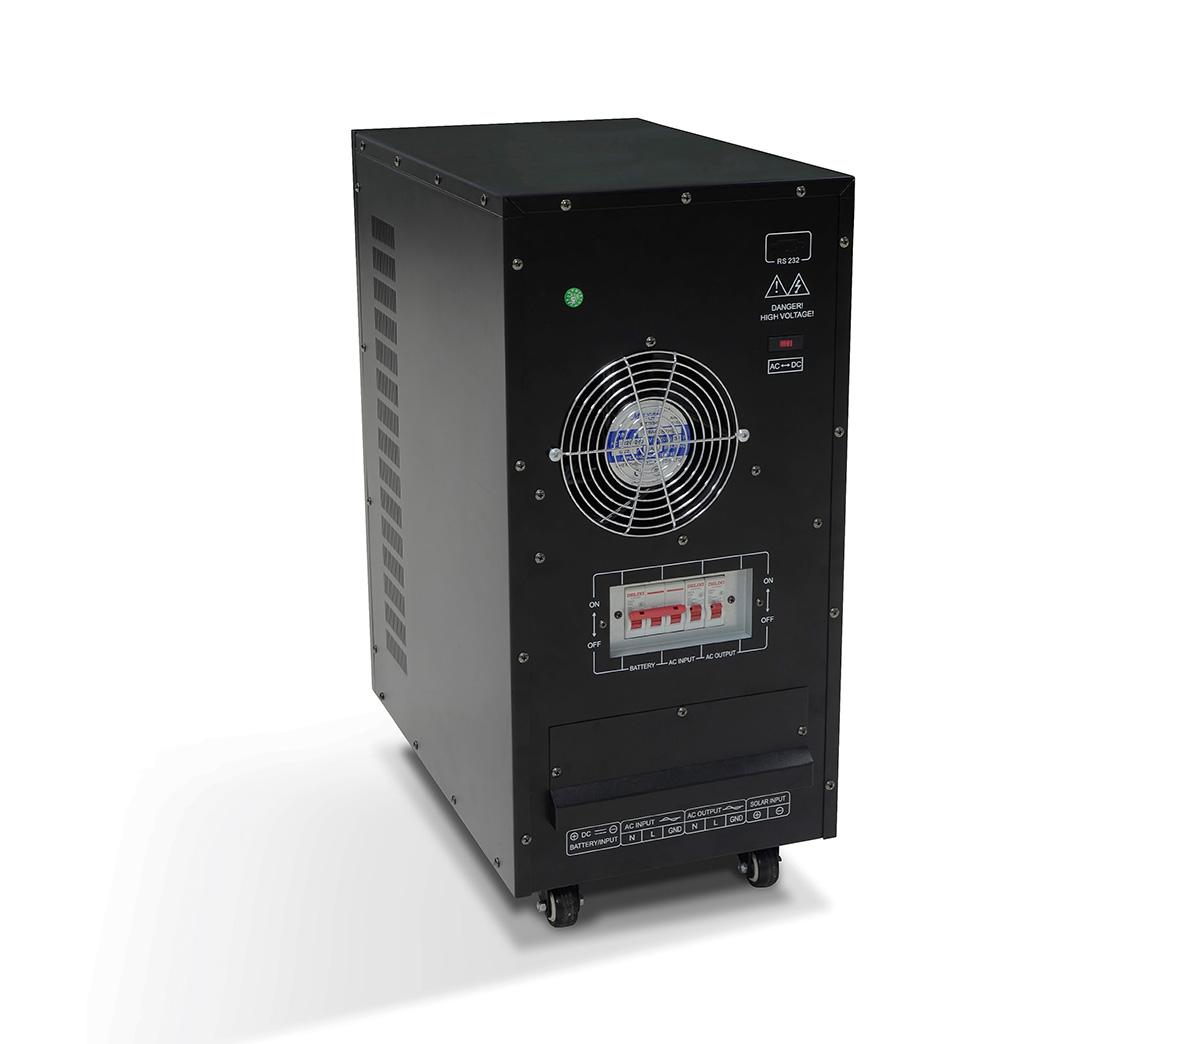 DC AC hybrid inverter 7kw 10kw